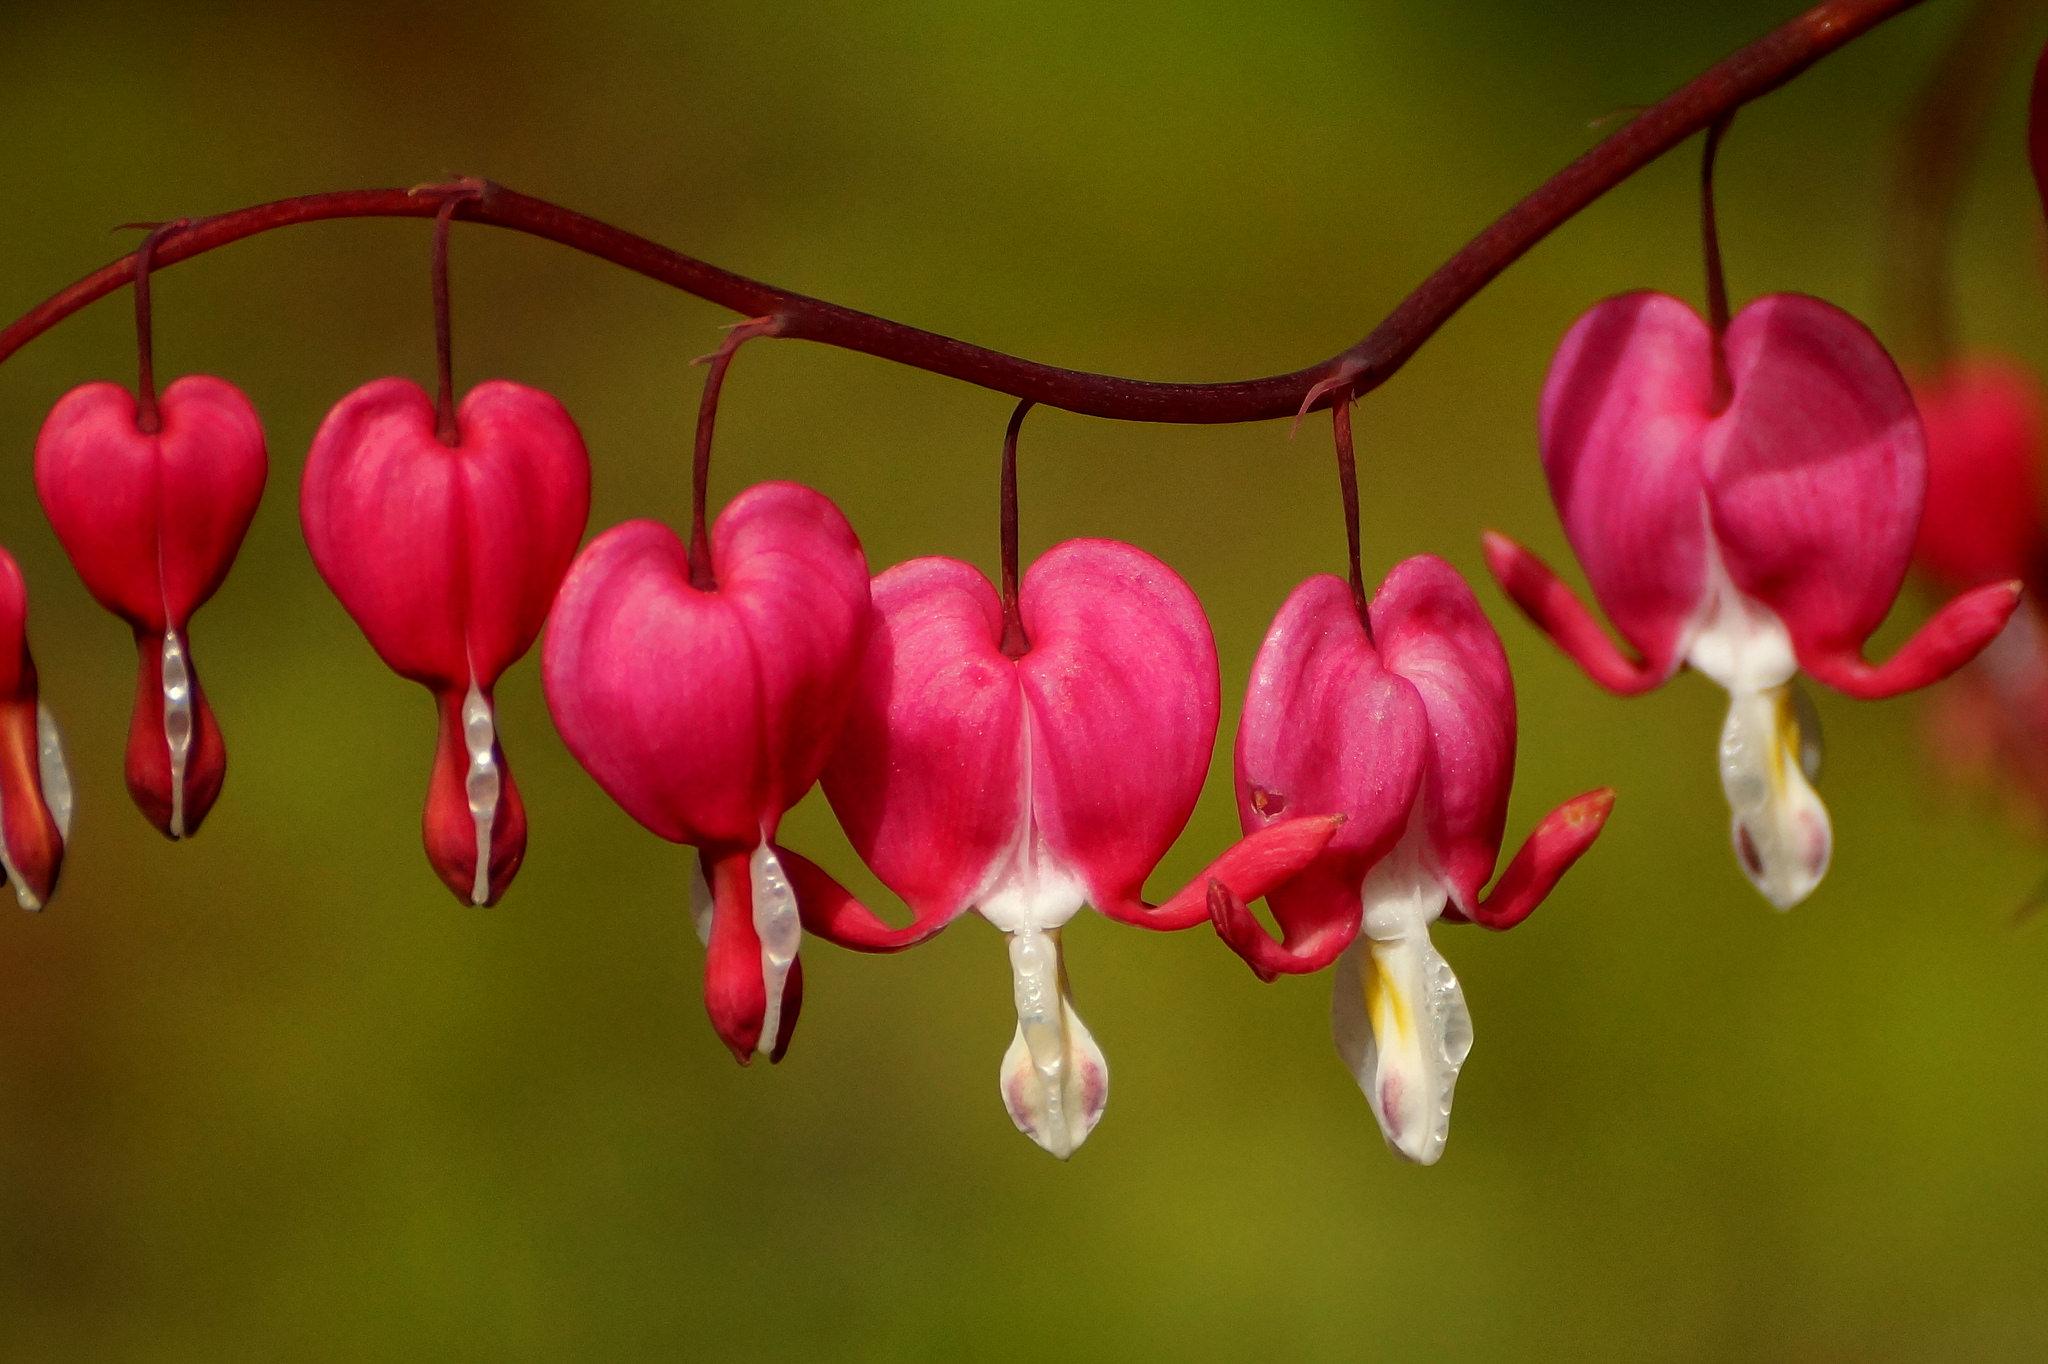 Dicentra spectabilis, Diclythra spectabilis – serduszka okazała, biskupie serce